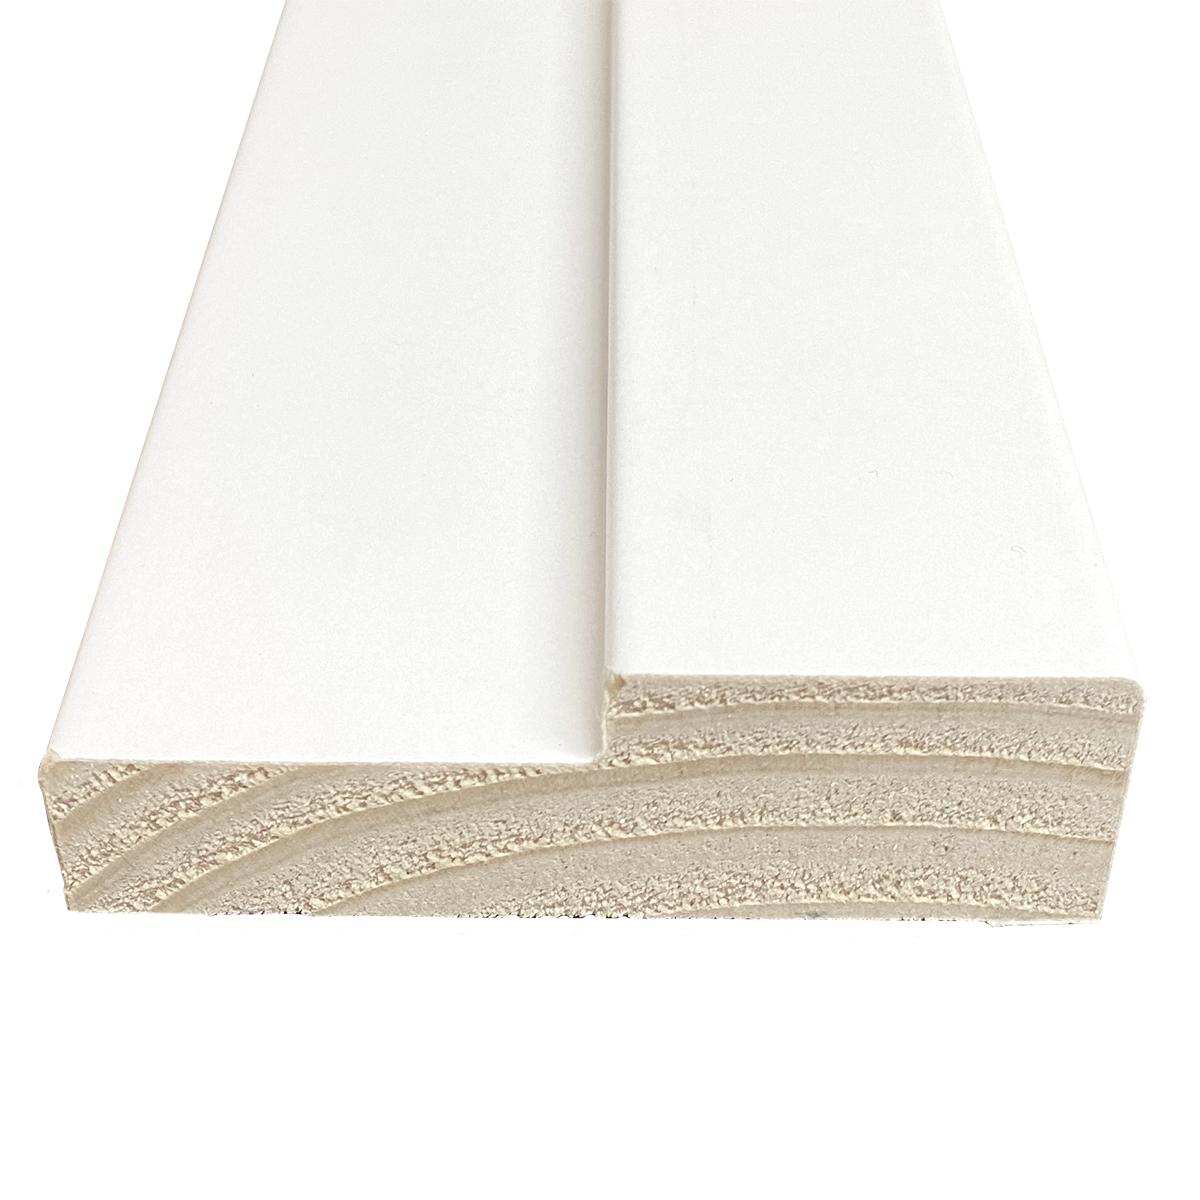 Tira Marco De Puerta Pino Finger Folio Blanco Reforzado 30x90x2500